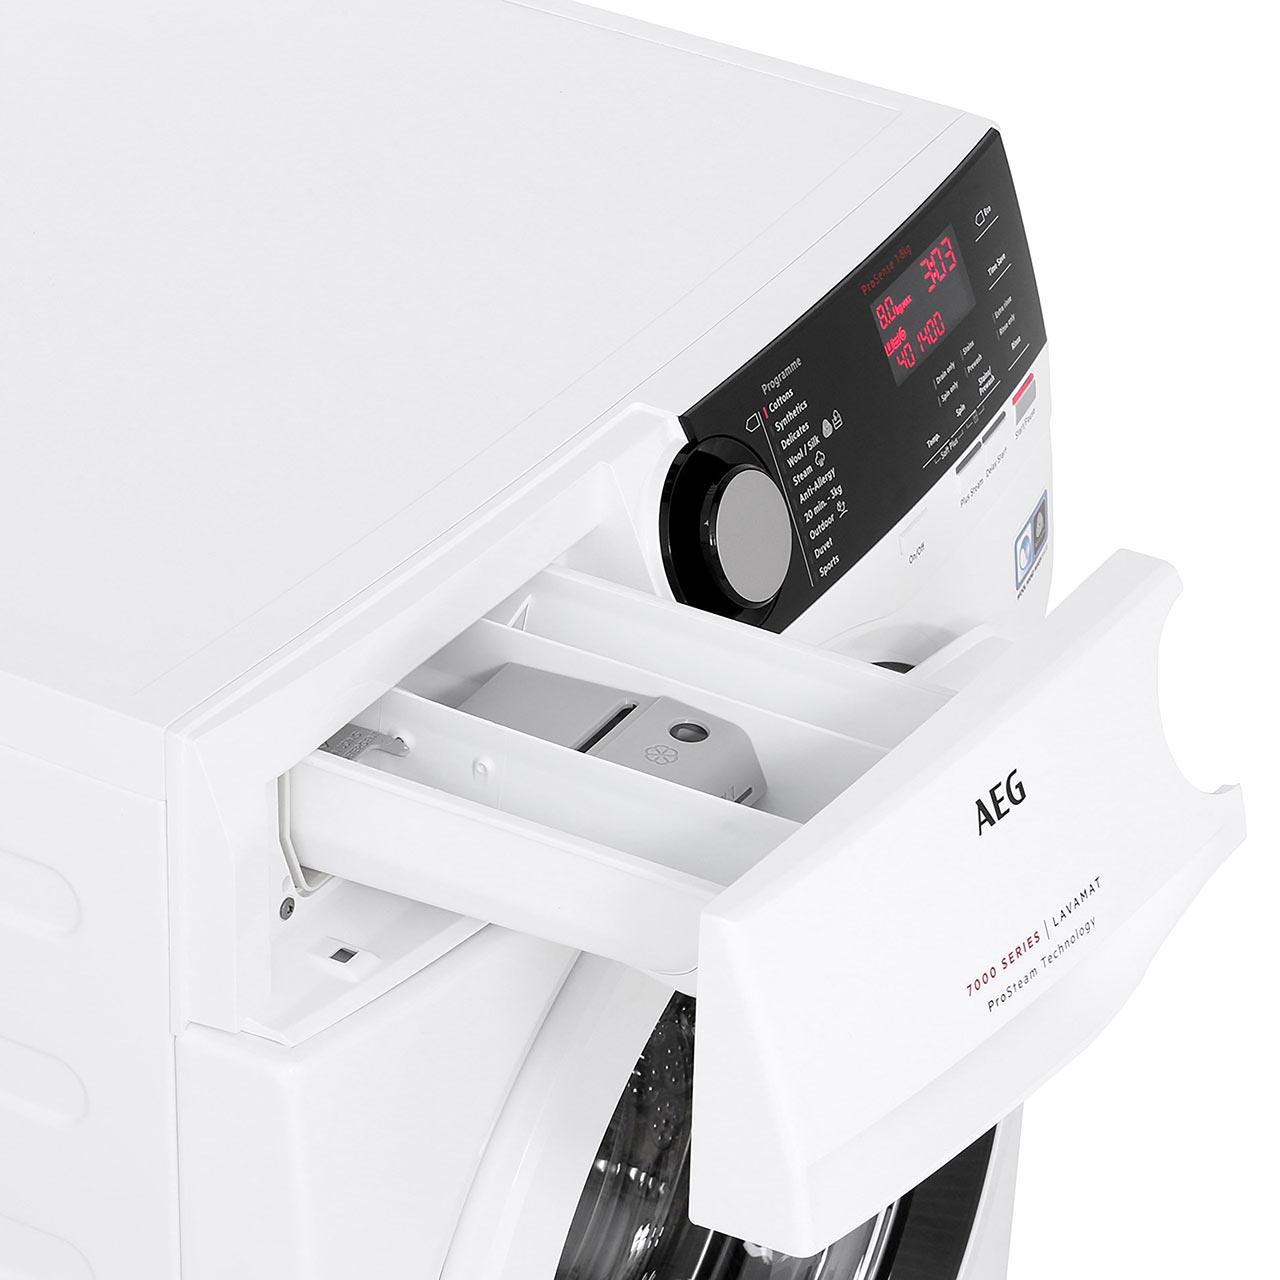 L7fbe841r Wh Aeg Washing Machine 8kg Printed Circuit Board Repairs For Tumble Dryers Electrolux